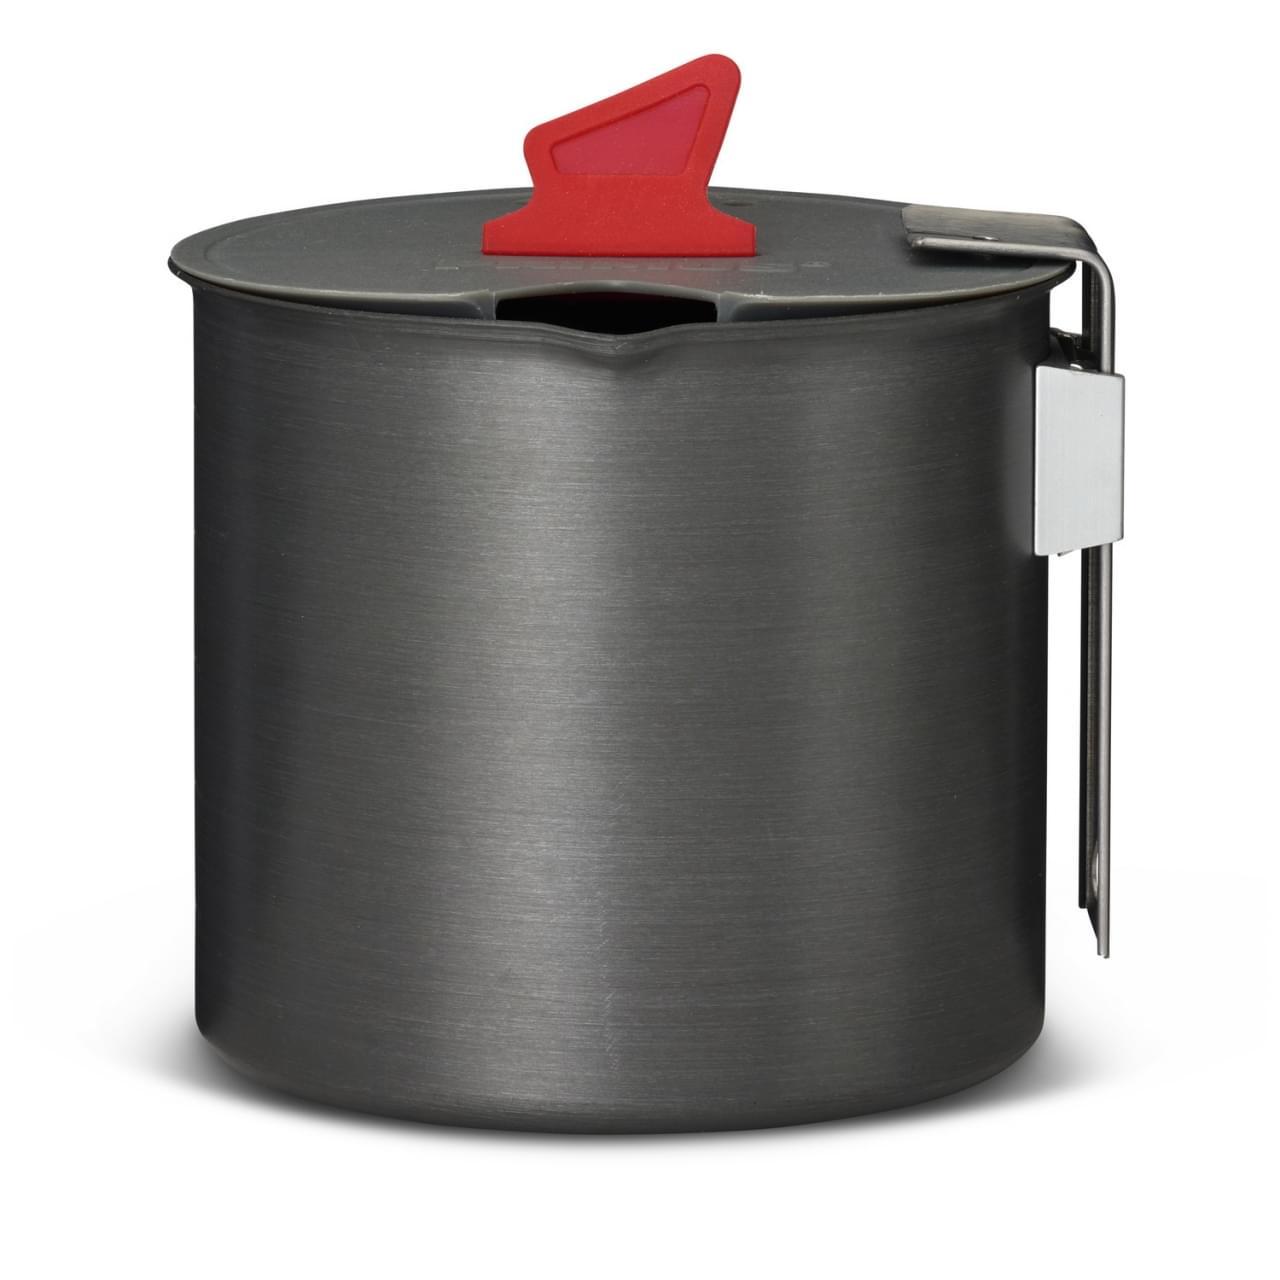 Primus Trek Pot 0.6 Pan